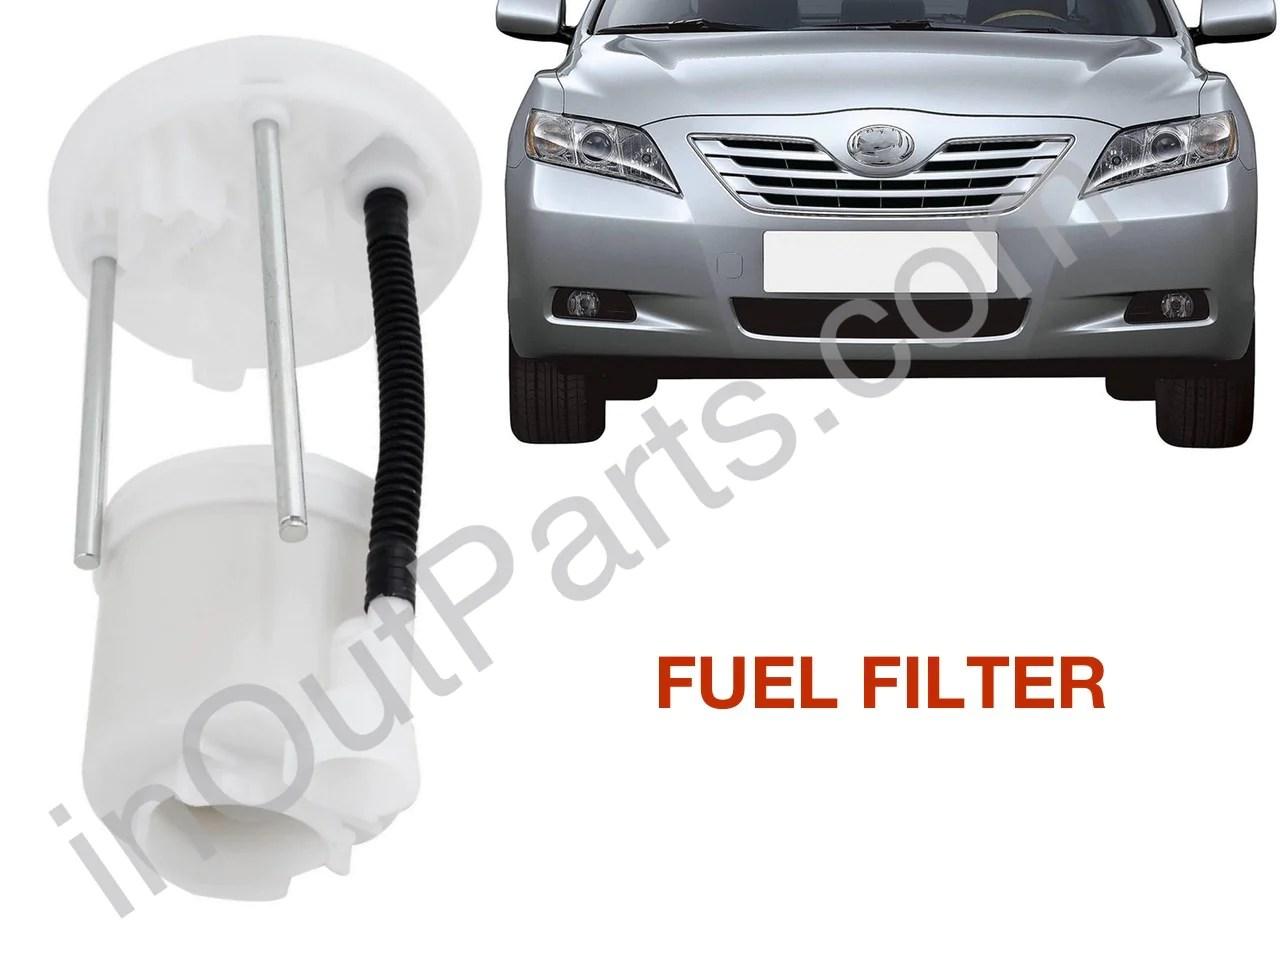 medium resolution of 2007 pontiac grand prix fuel filter